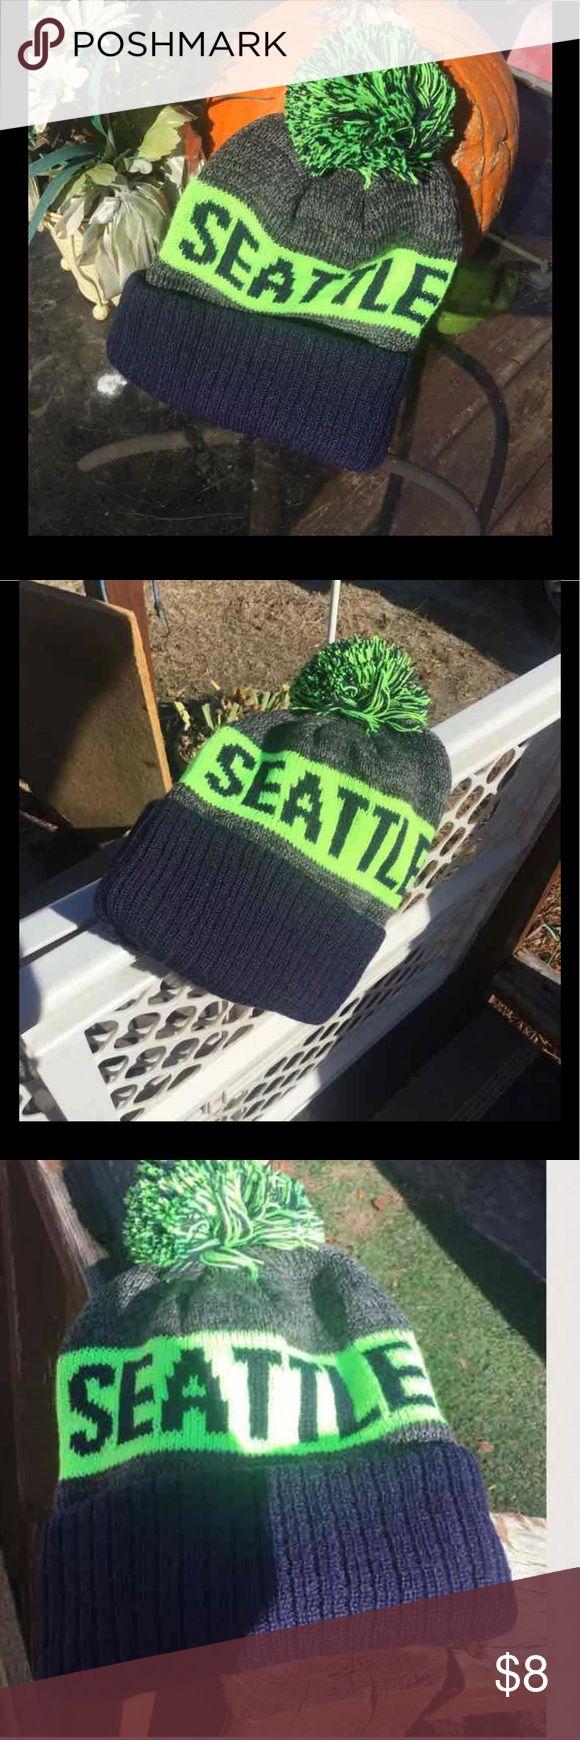 Seahawks Team Beanie Brand New Team Beanie ,Seahawks neon green and black Accessories Hats